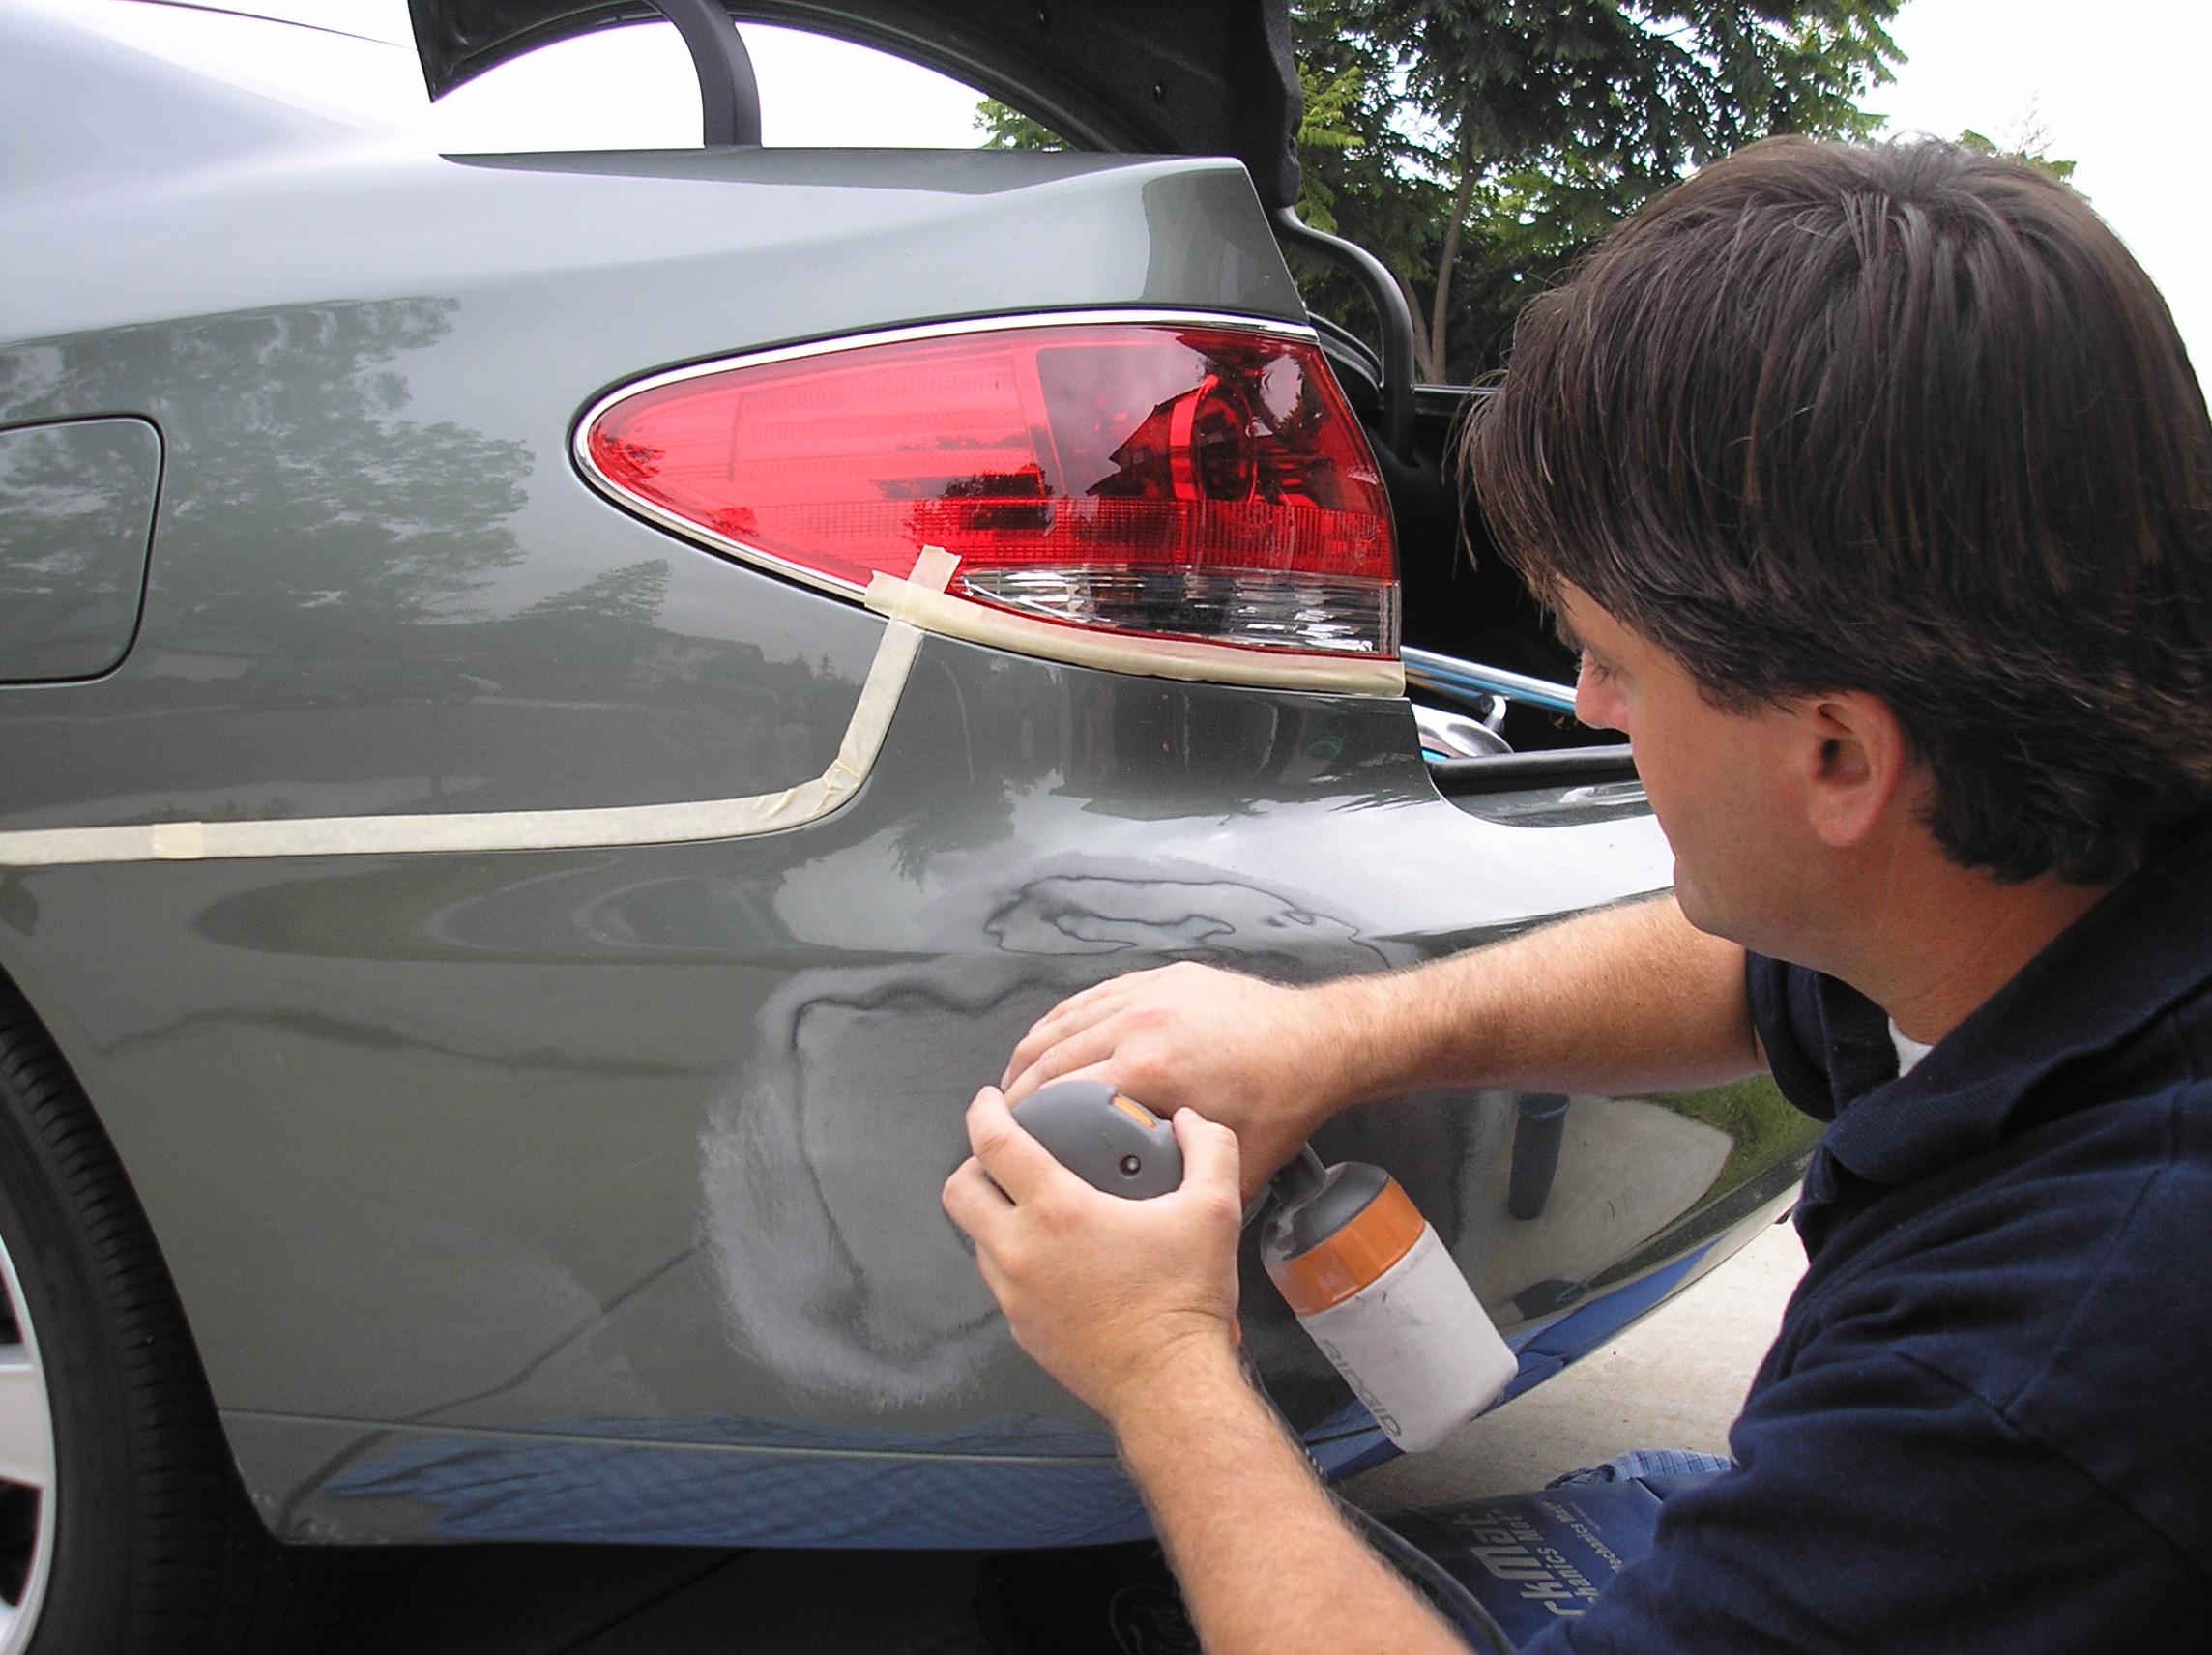 Ремонт царапин на автомобиле своими руками видео